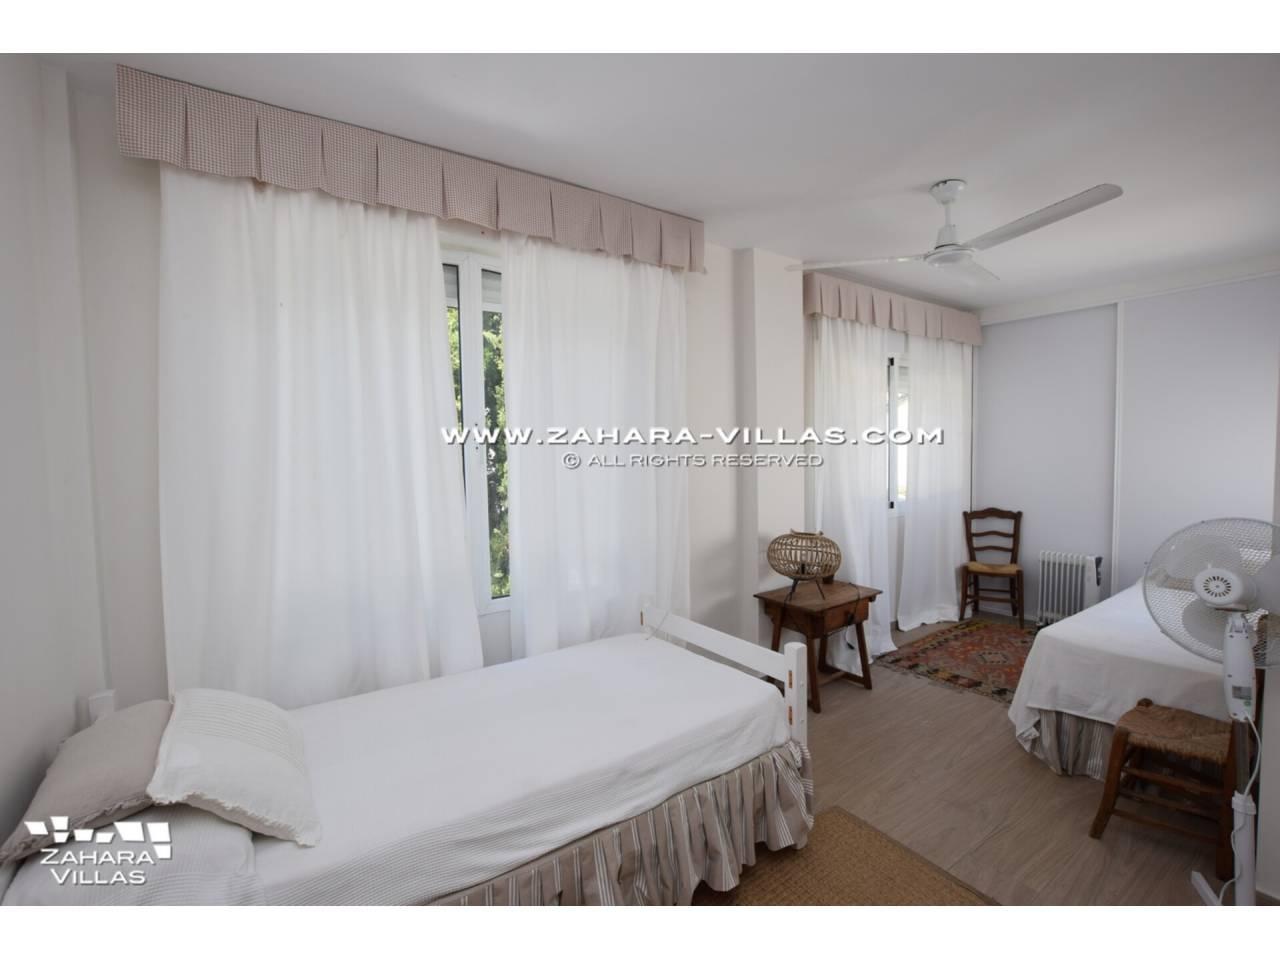 Imagen 28 de House for sale close to the beach, with sea views in Zahara de los Atunes